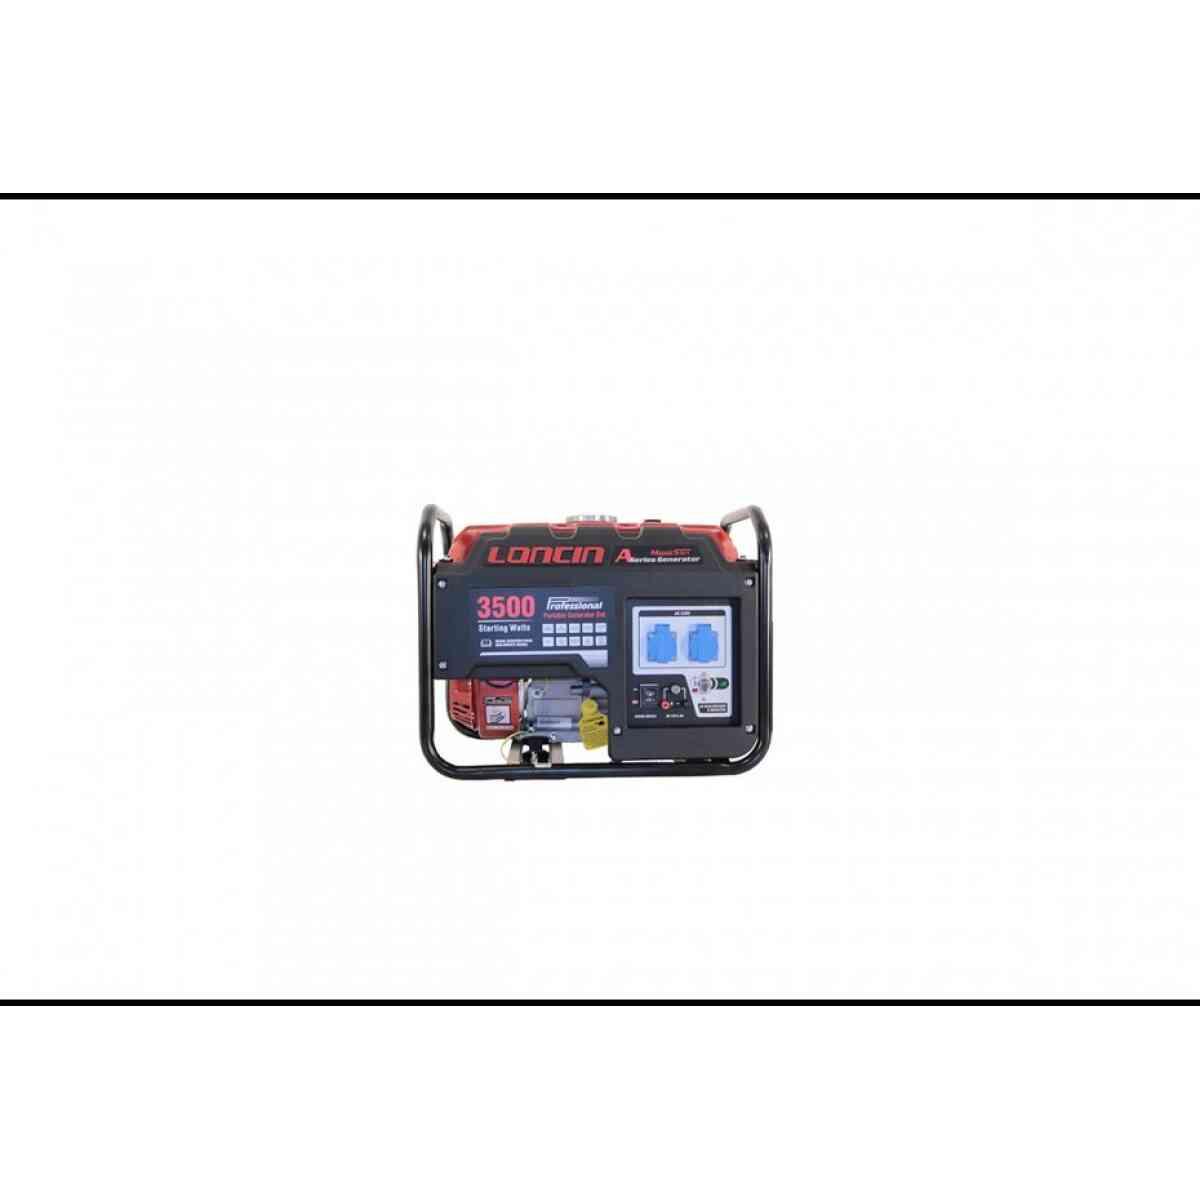 generator loncin 31 kw 220v a series padure gardina.ro 22